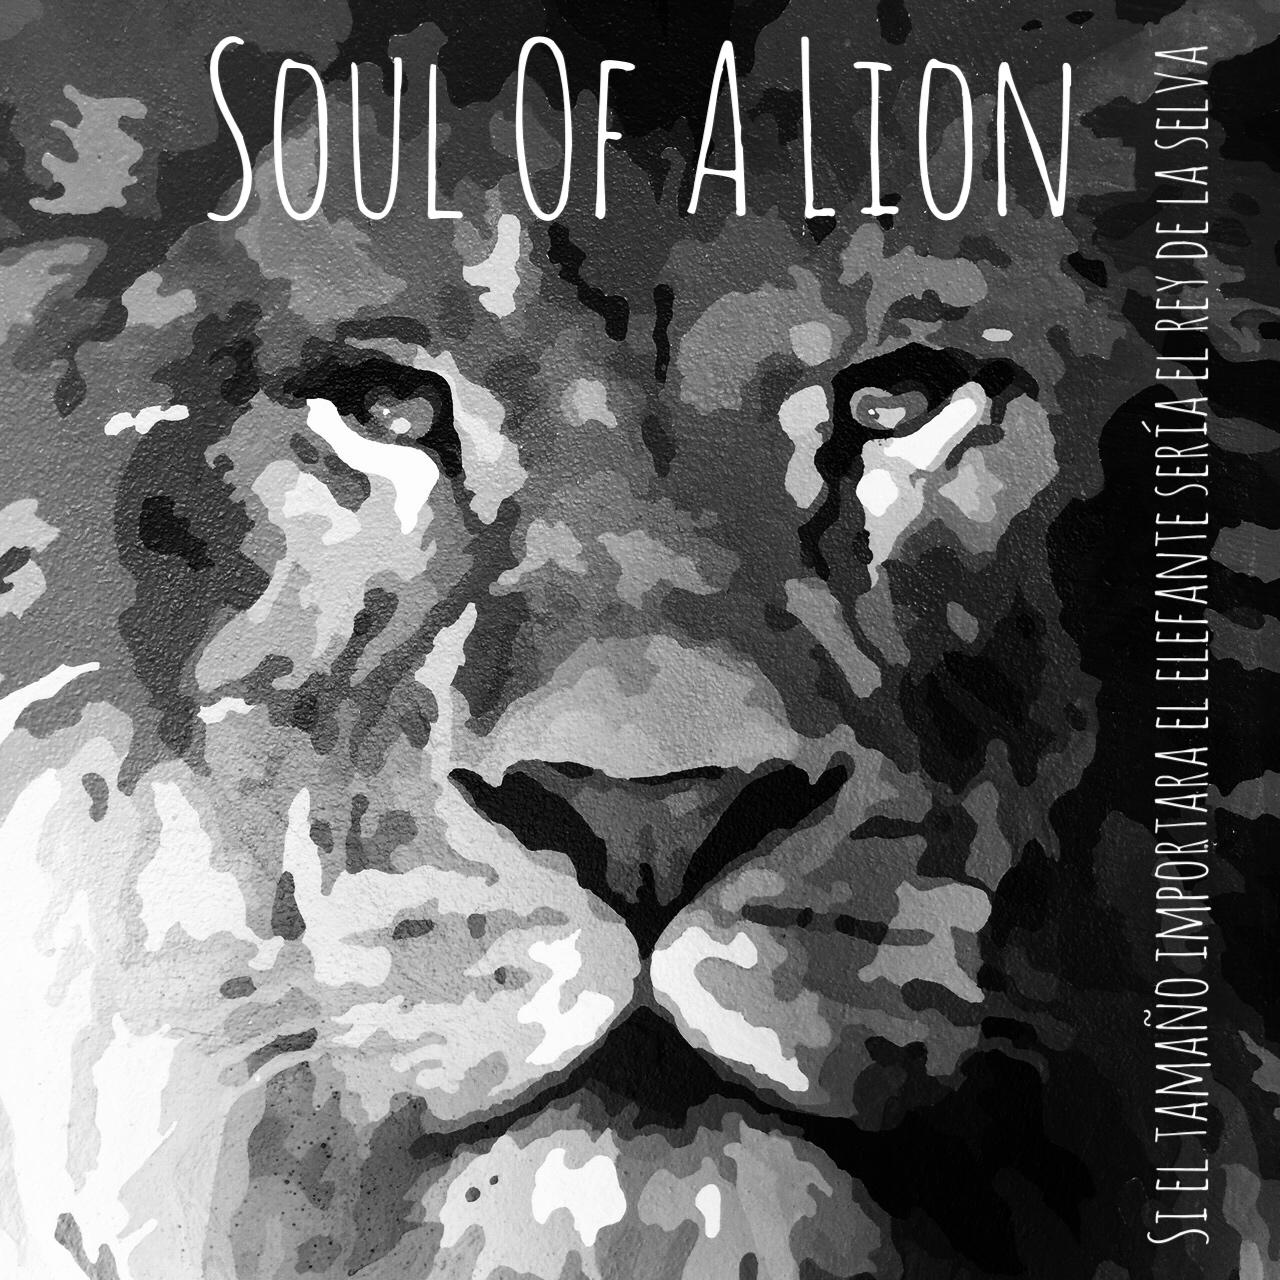 Wod CFS Box CrossFit Sevilla Soul of Lion